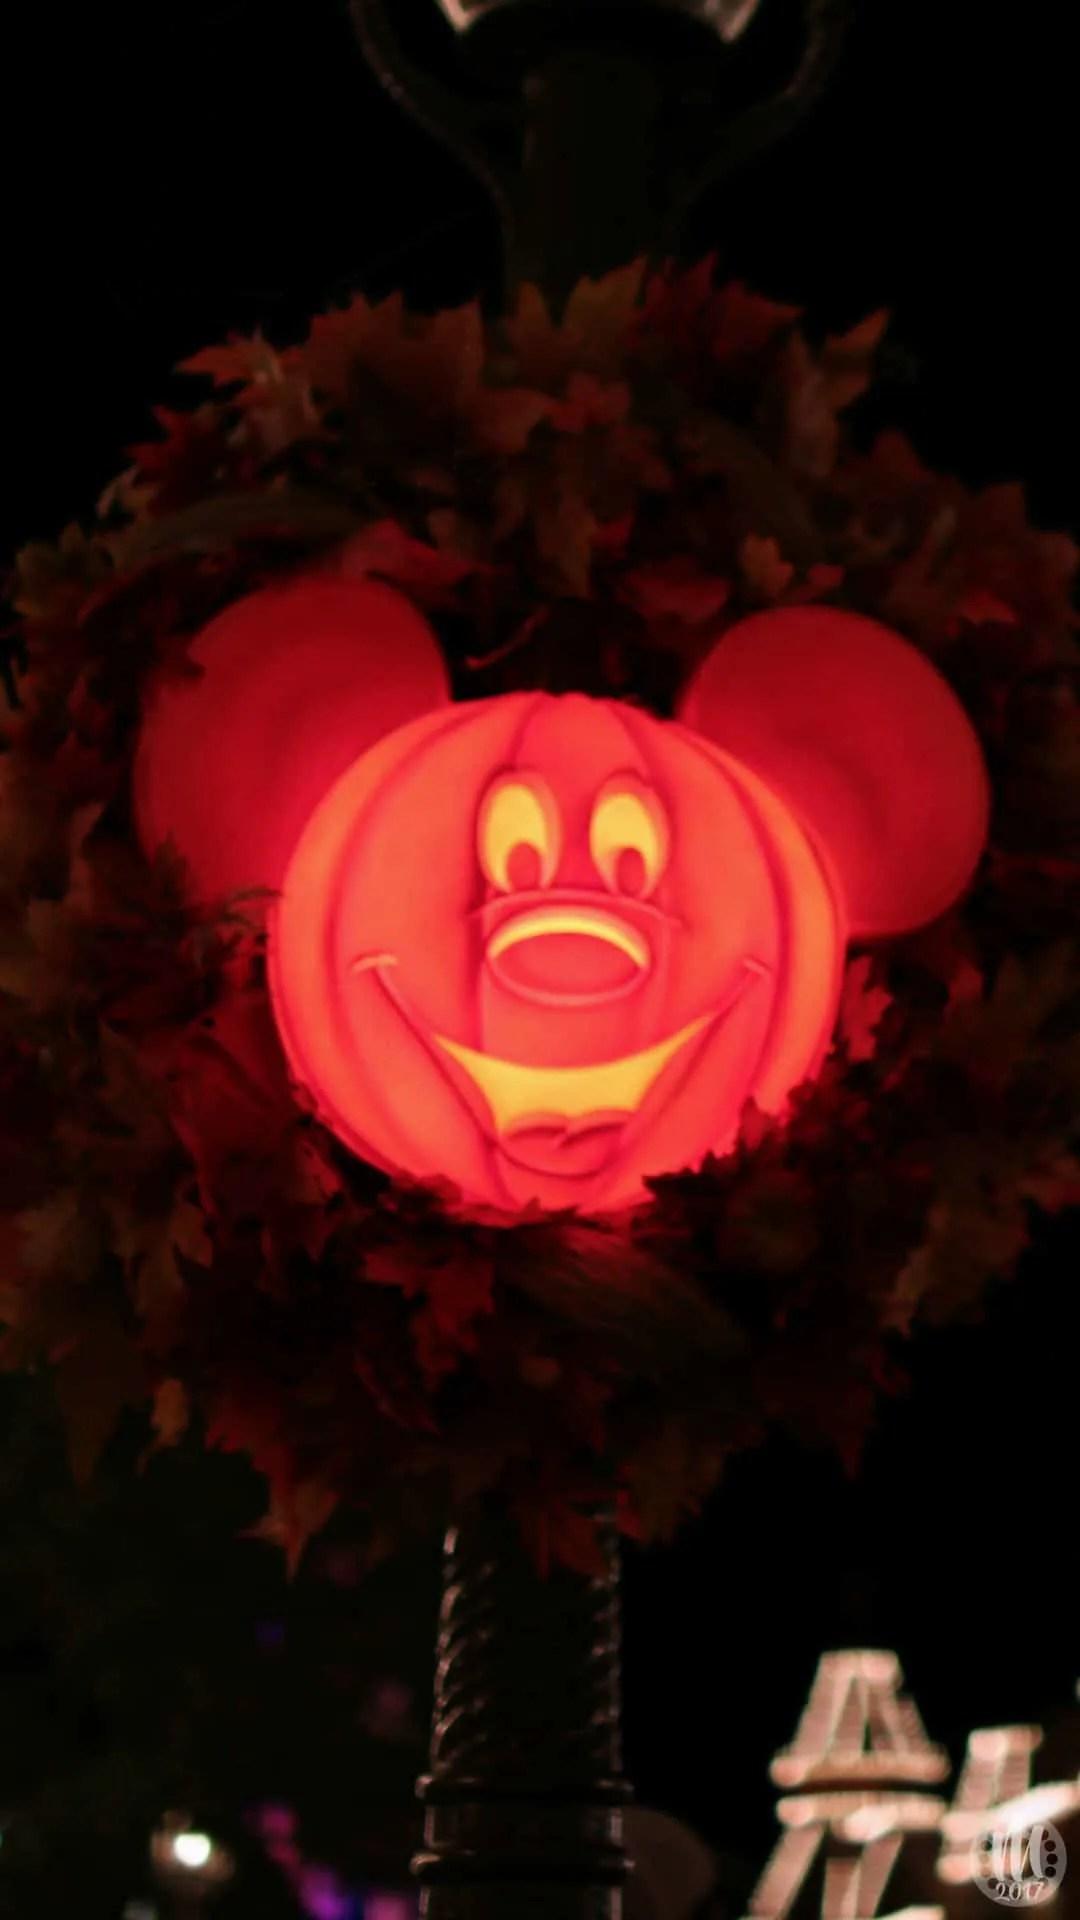 Fantastic Wallpaper Halloween Red - Walt-Disney-World-Halloween-iPhone-Wallpapers-6  Pic_425452.jpg?resize\u003d1080%2C1920\u0026ssl\u003d1